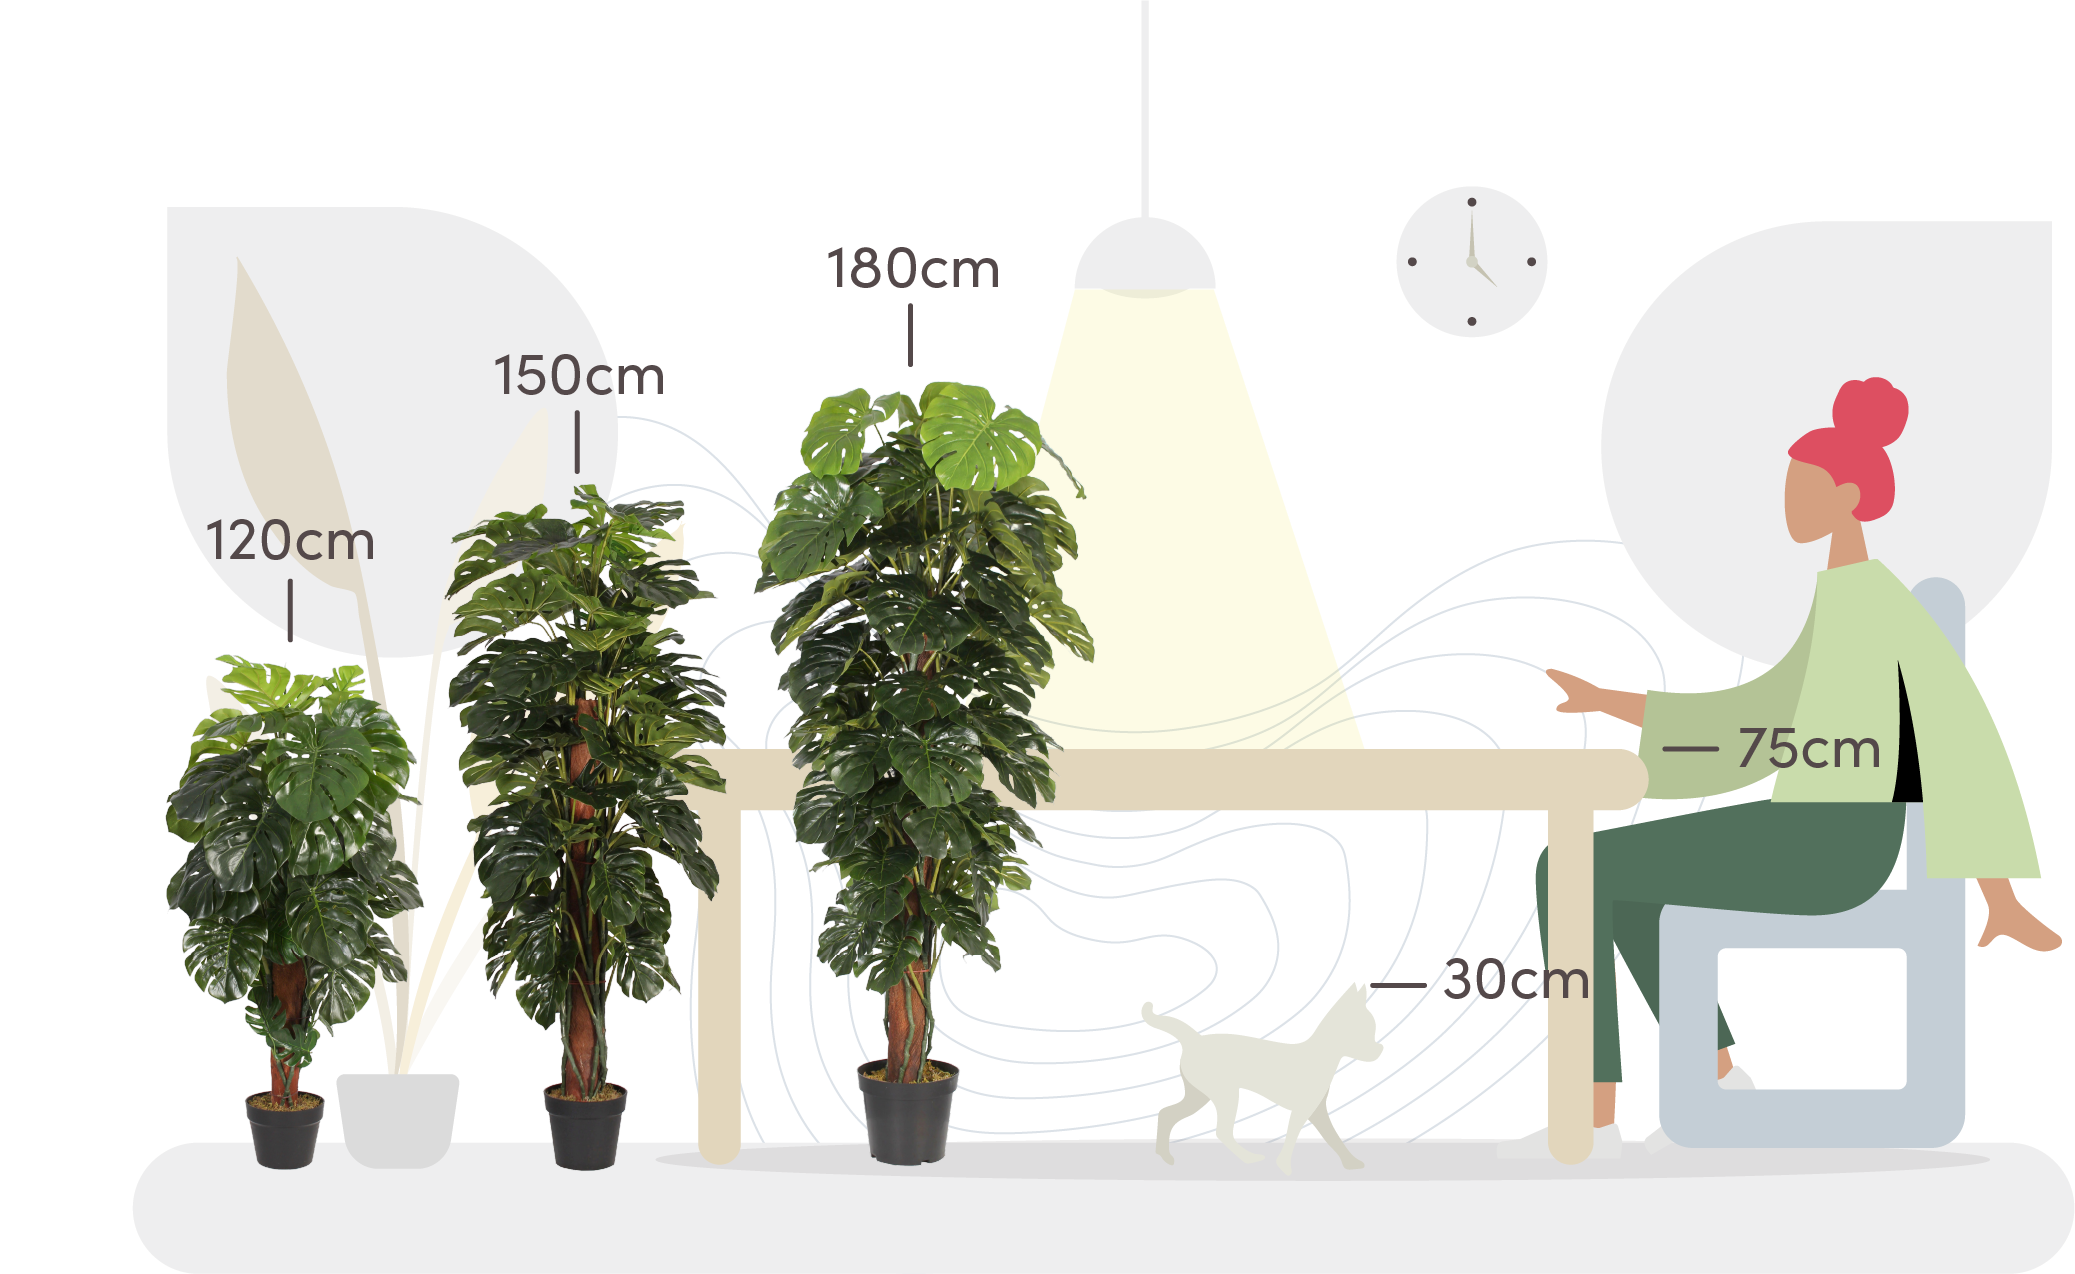 Cheese plant size comparison